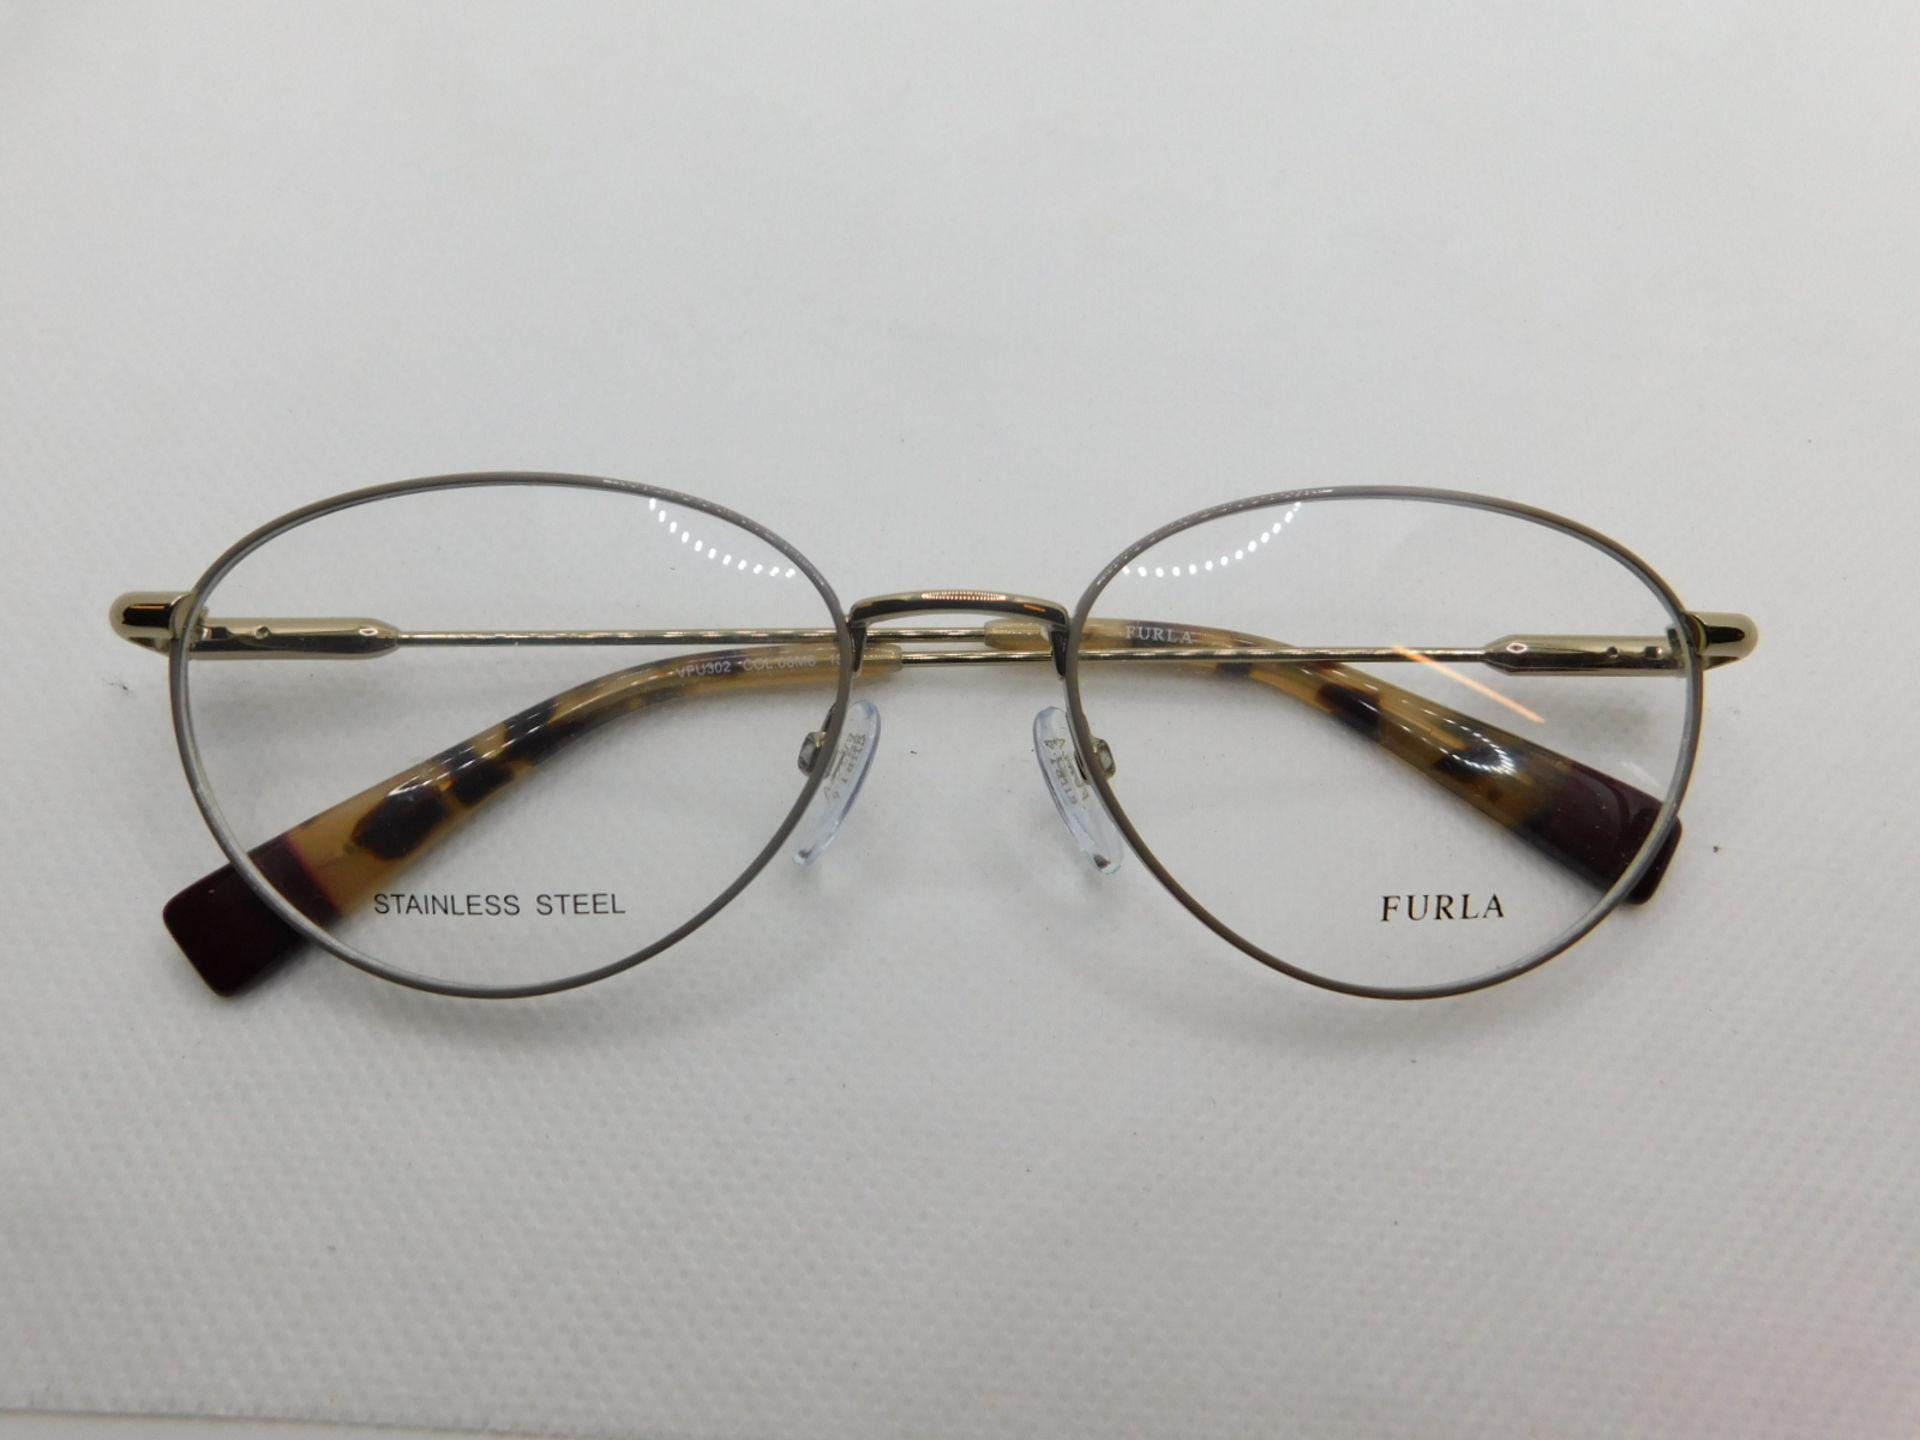 1 PAIR OF FURLA GLASSES FRAME MODEL VFU302 RRP £99.99